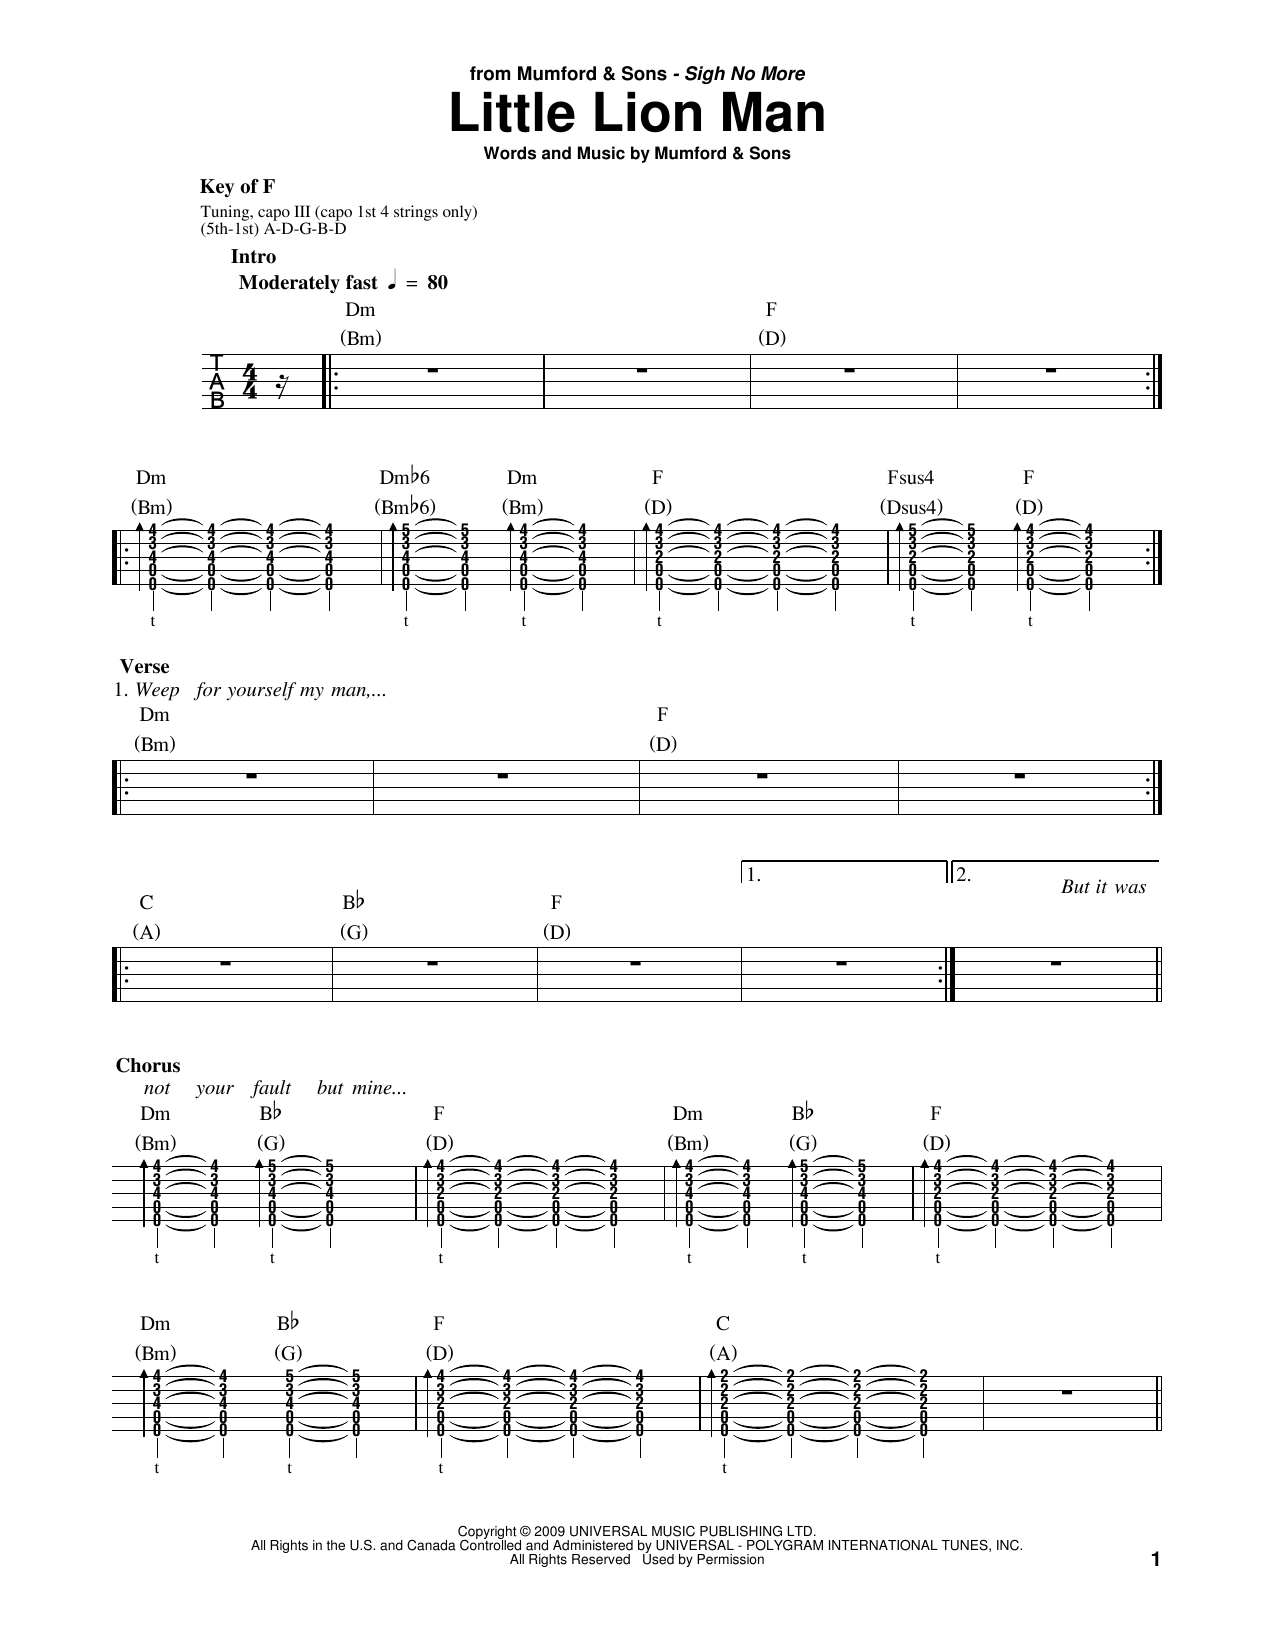 Little lion man sheet music by mumford sons banjo 178449 little lion man sheet music hexwebz Images